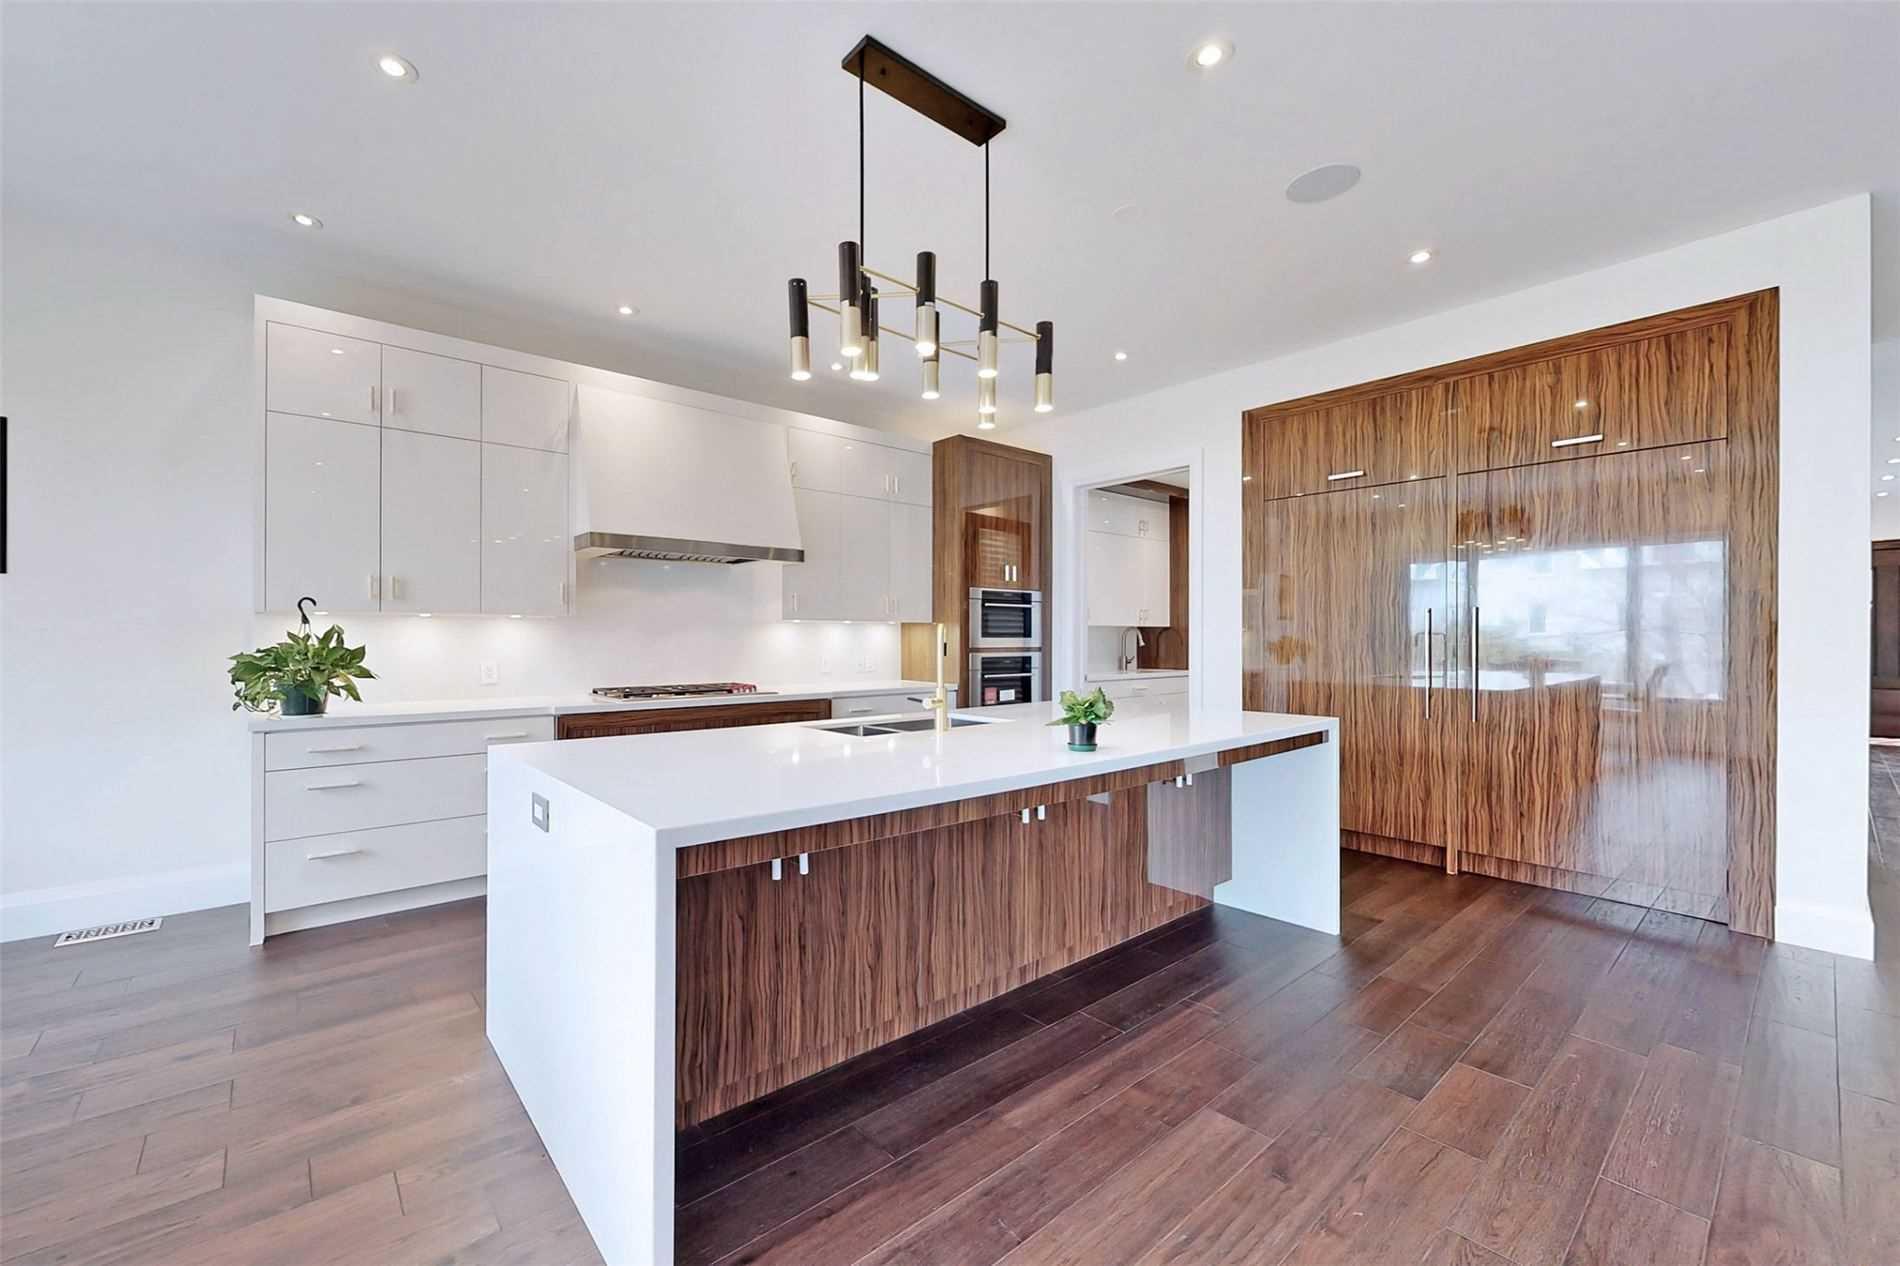 216 Olive Ave, Toronto, Ontario M2N4P6, 4 Bedrooms Bedrooms, 11 Rooms Rooms,7 BathroomsBathrooms,Detached,For Sale,Olive,C5168437